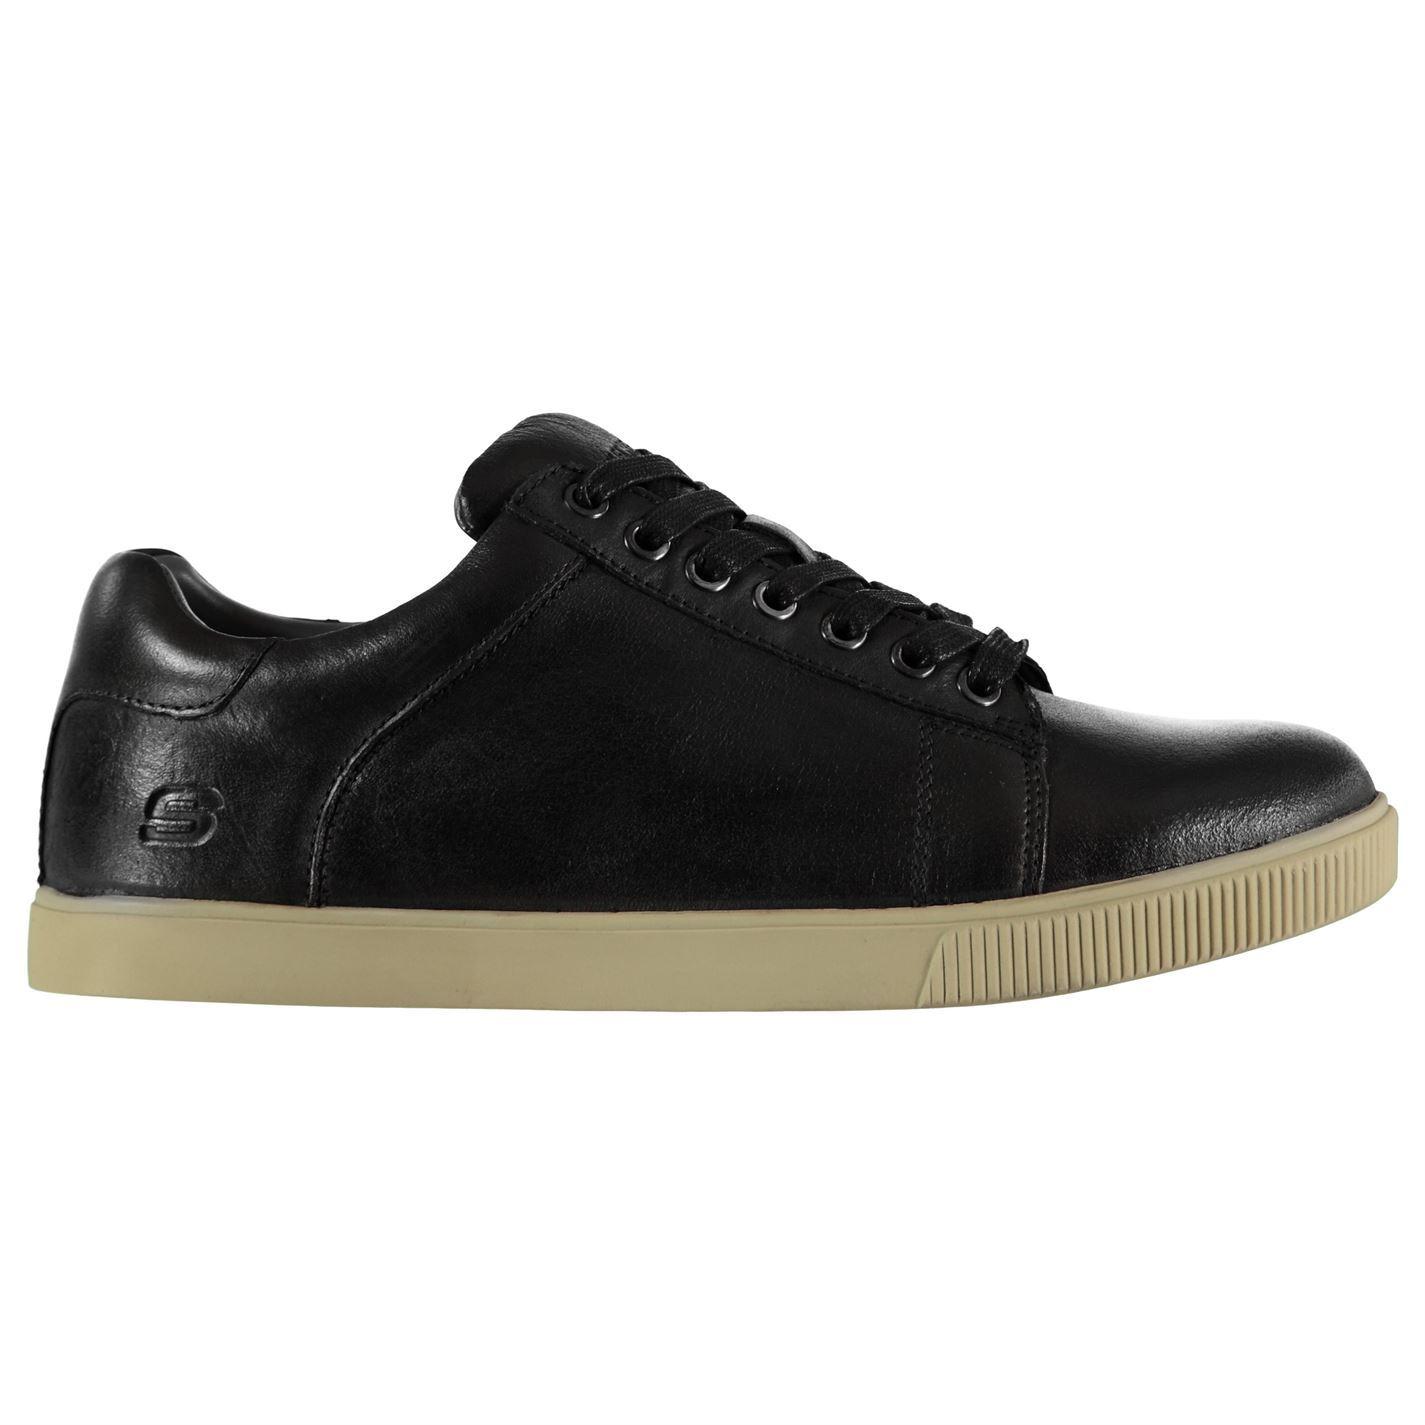 Skechers-Vol-Fandom-Homme-Chaussures-Baskets-decontractees-chaussures-baskets miniature 4